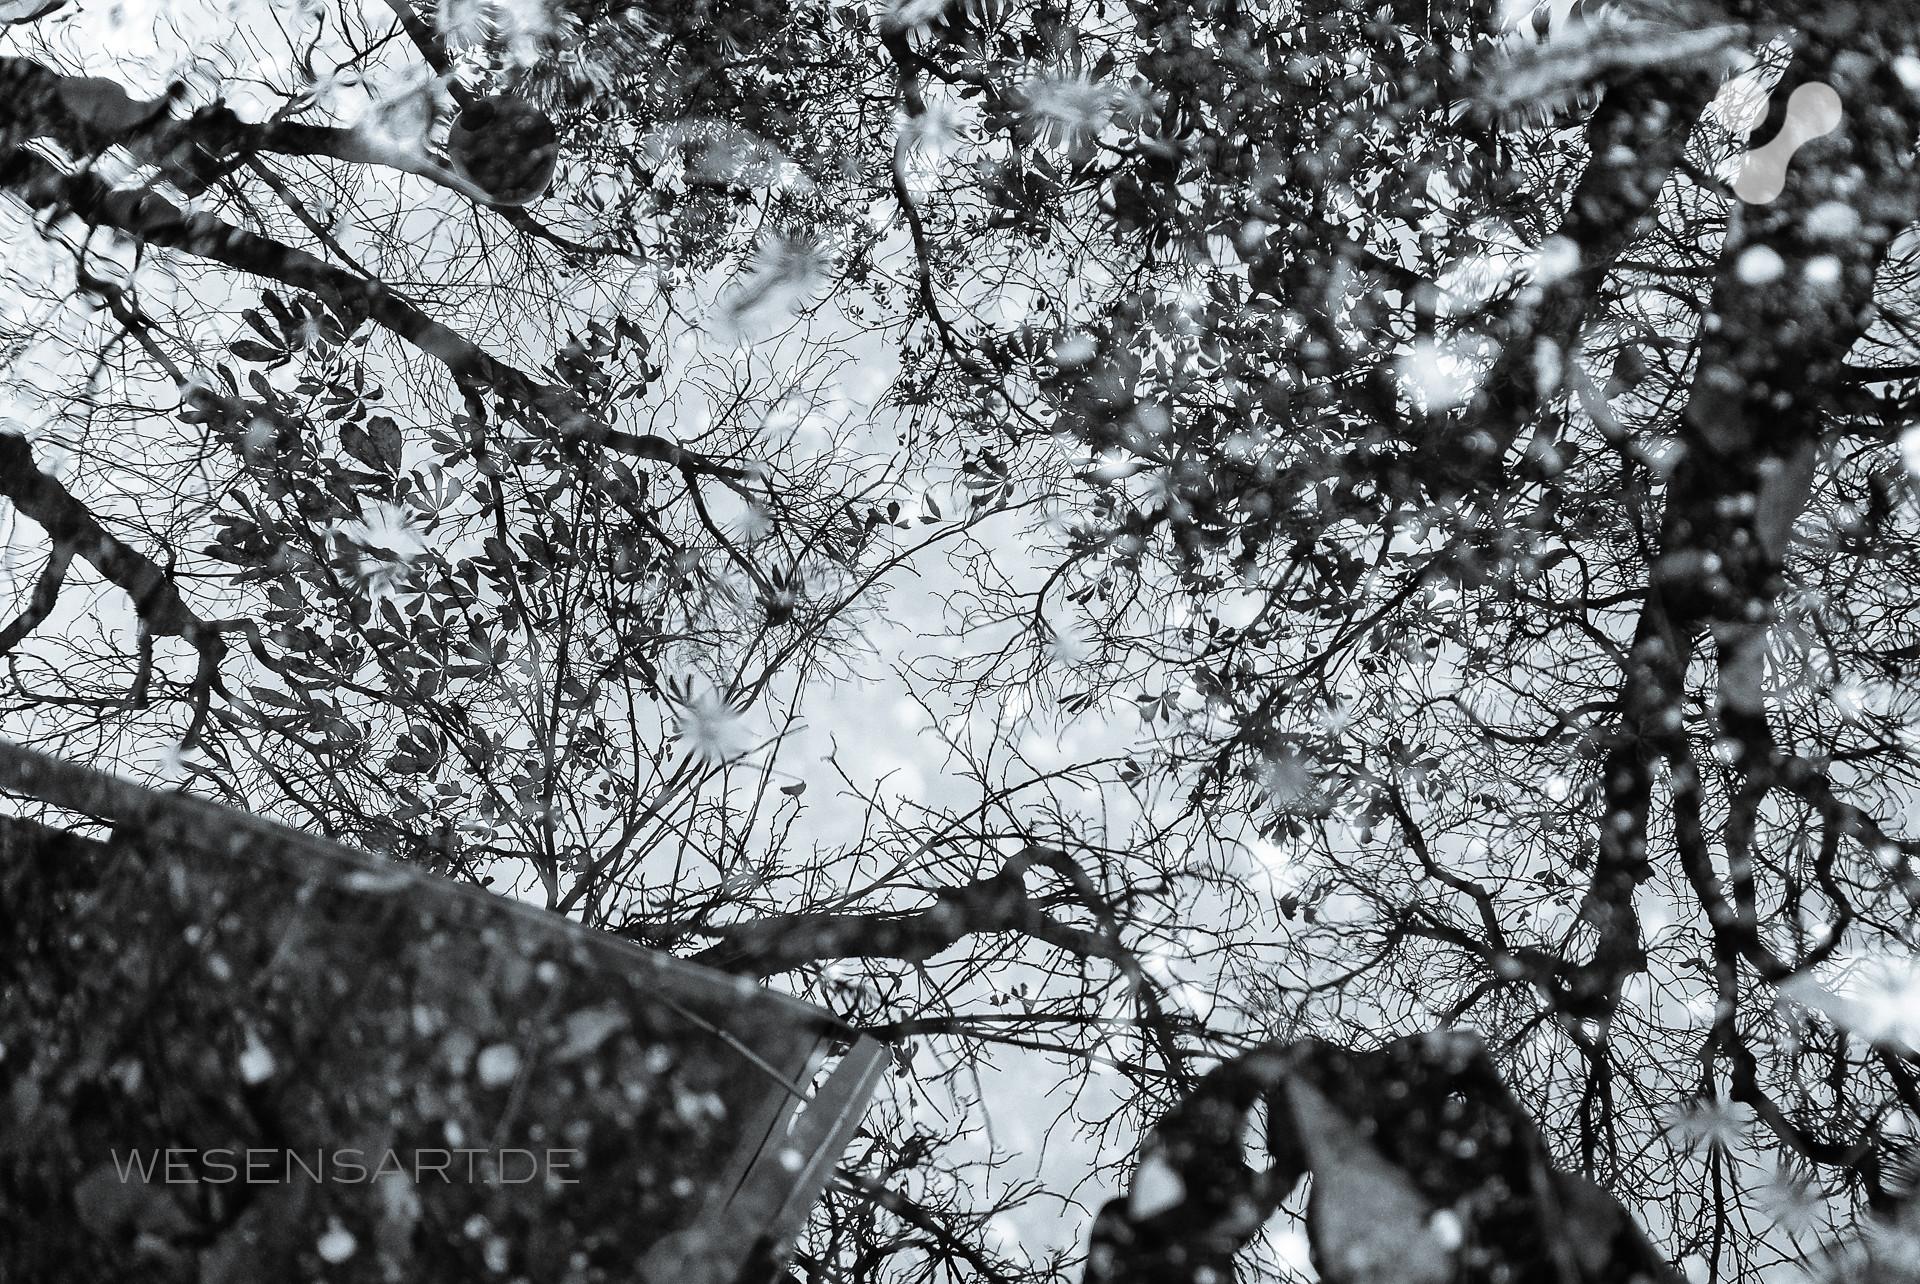 Kaltes Novembergrau